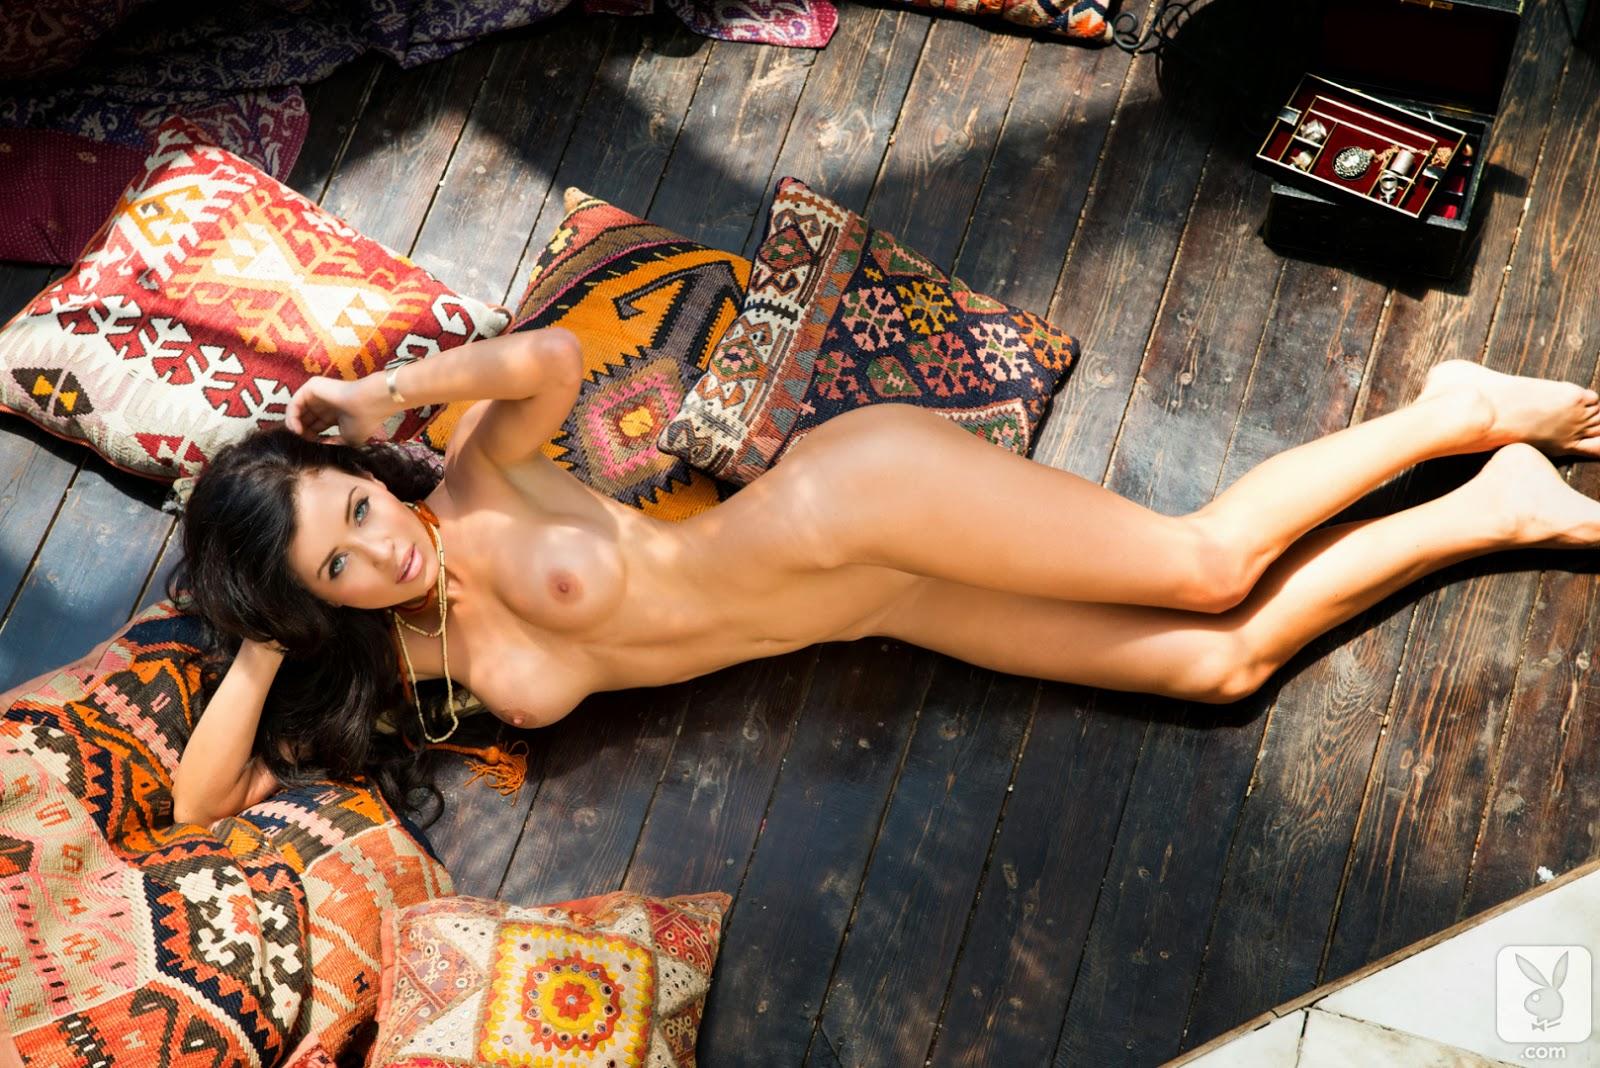 Gemma Lee Farrell Nude Beautiful gemma lee farrell in director's choice | hot pics